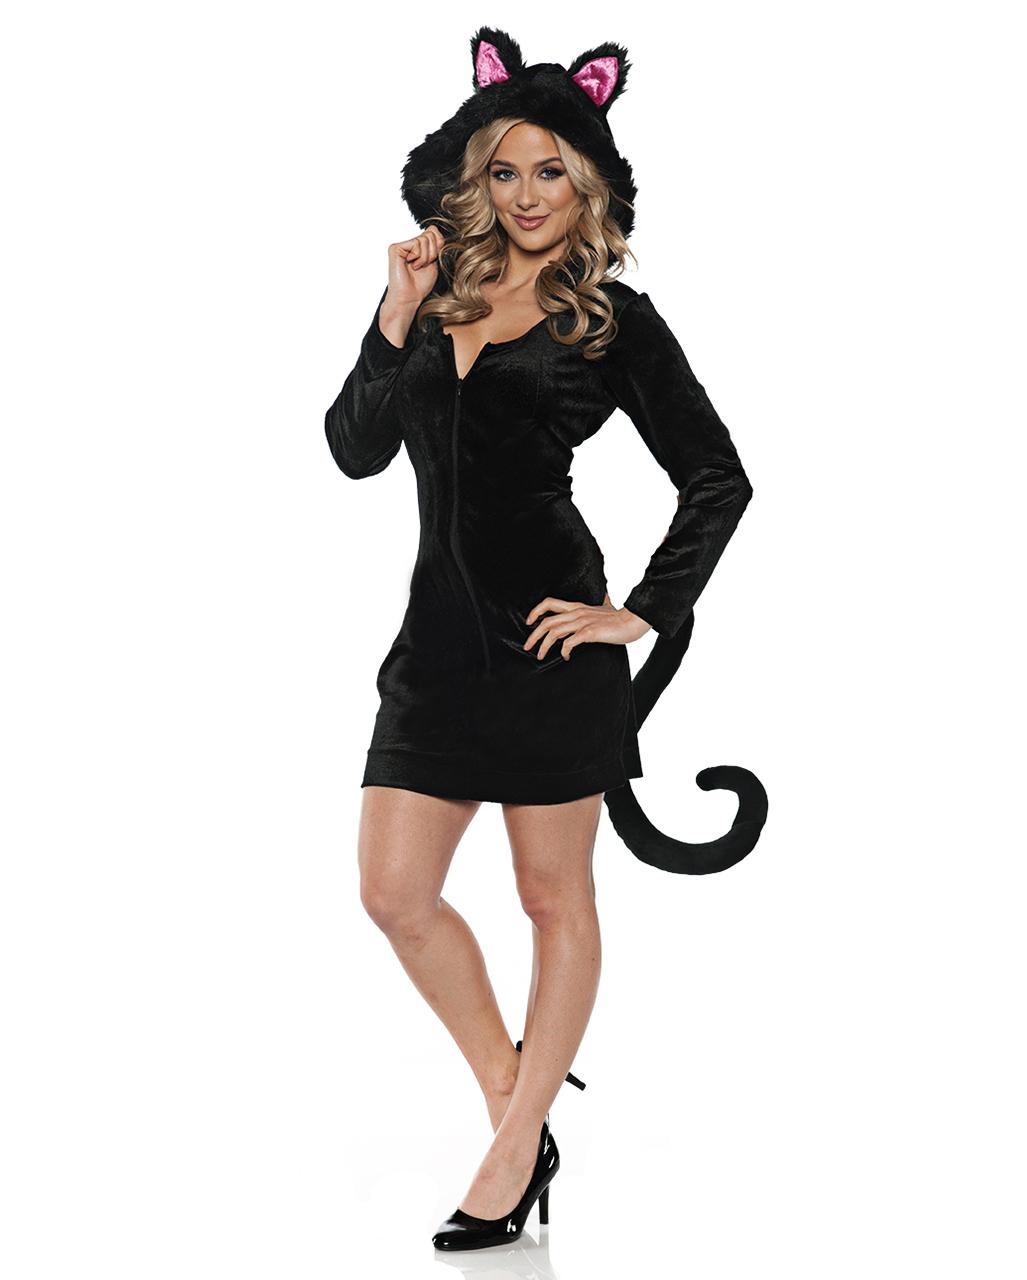 Schwarze Katze Kostum Kleid Fur Fasching Horror Shop Com